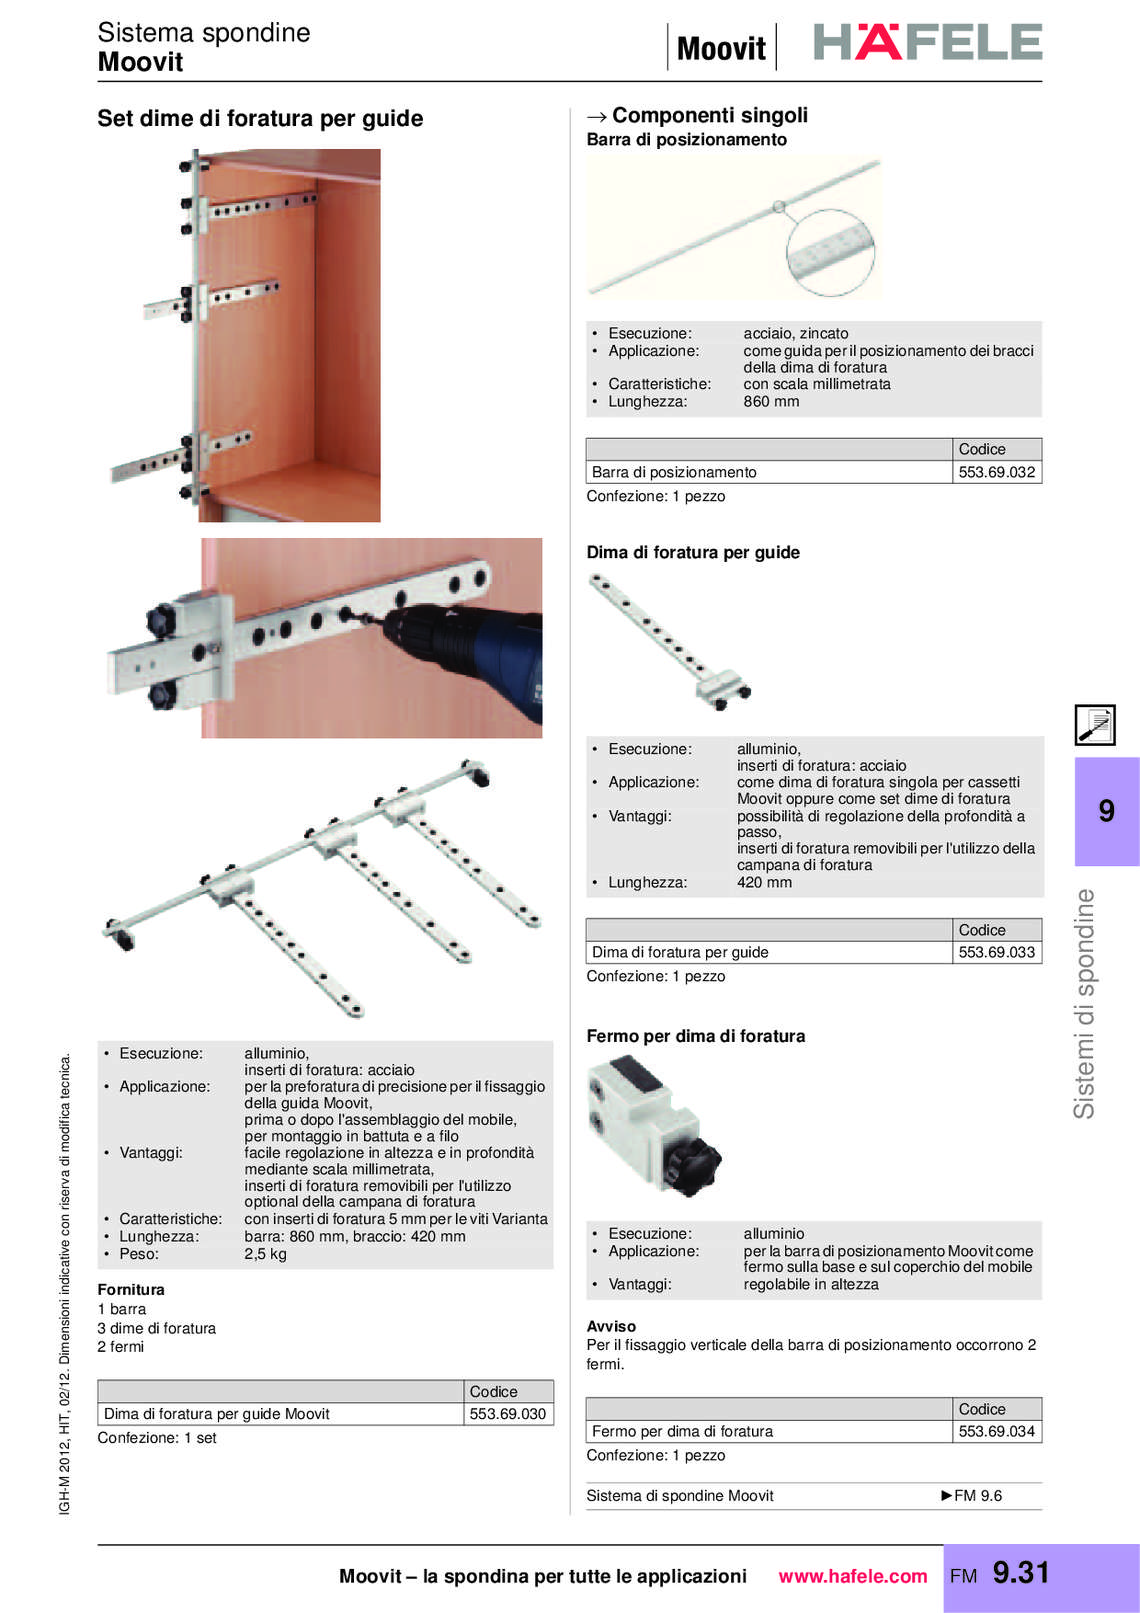 hafele-spondine-e-guide-per-mobili_40_044.jpg